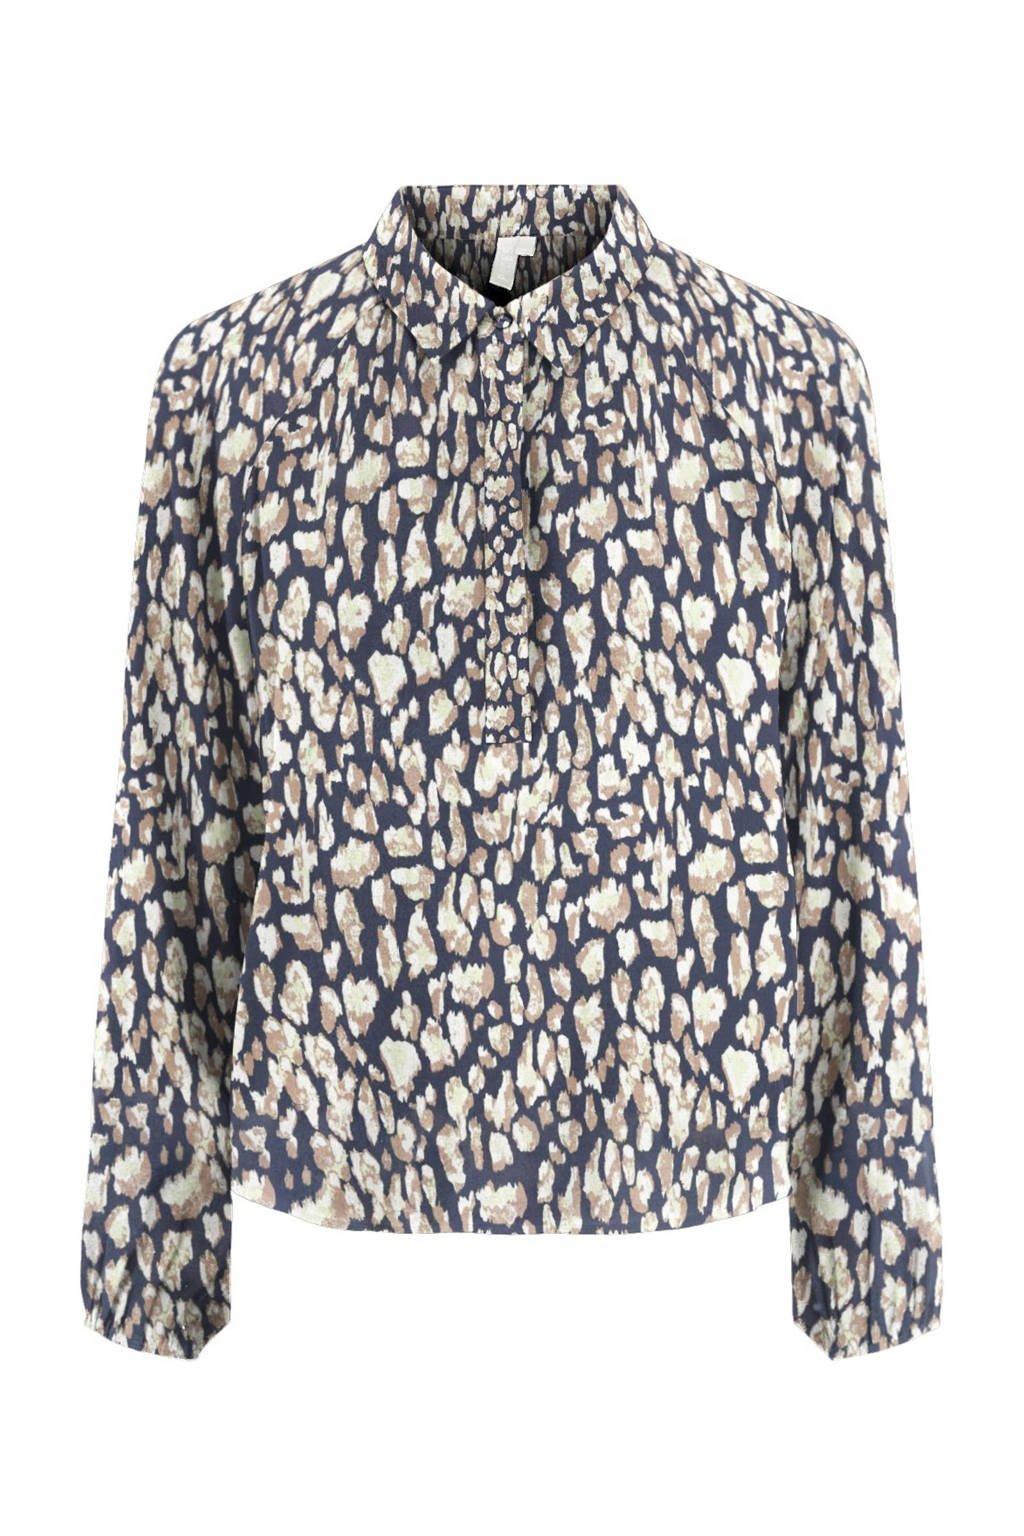 PIECES blouse met all over print blauw, Blauw